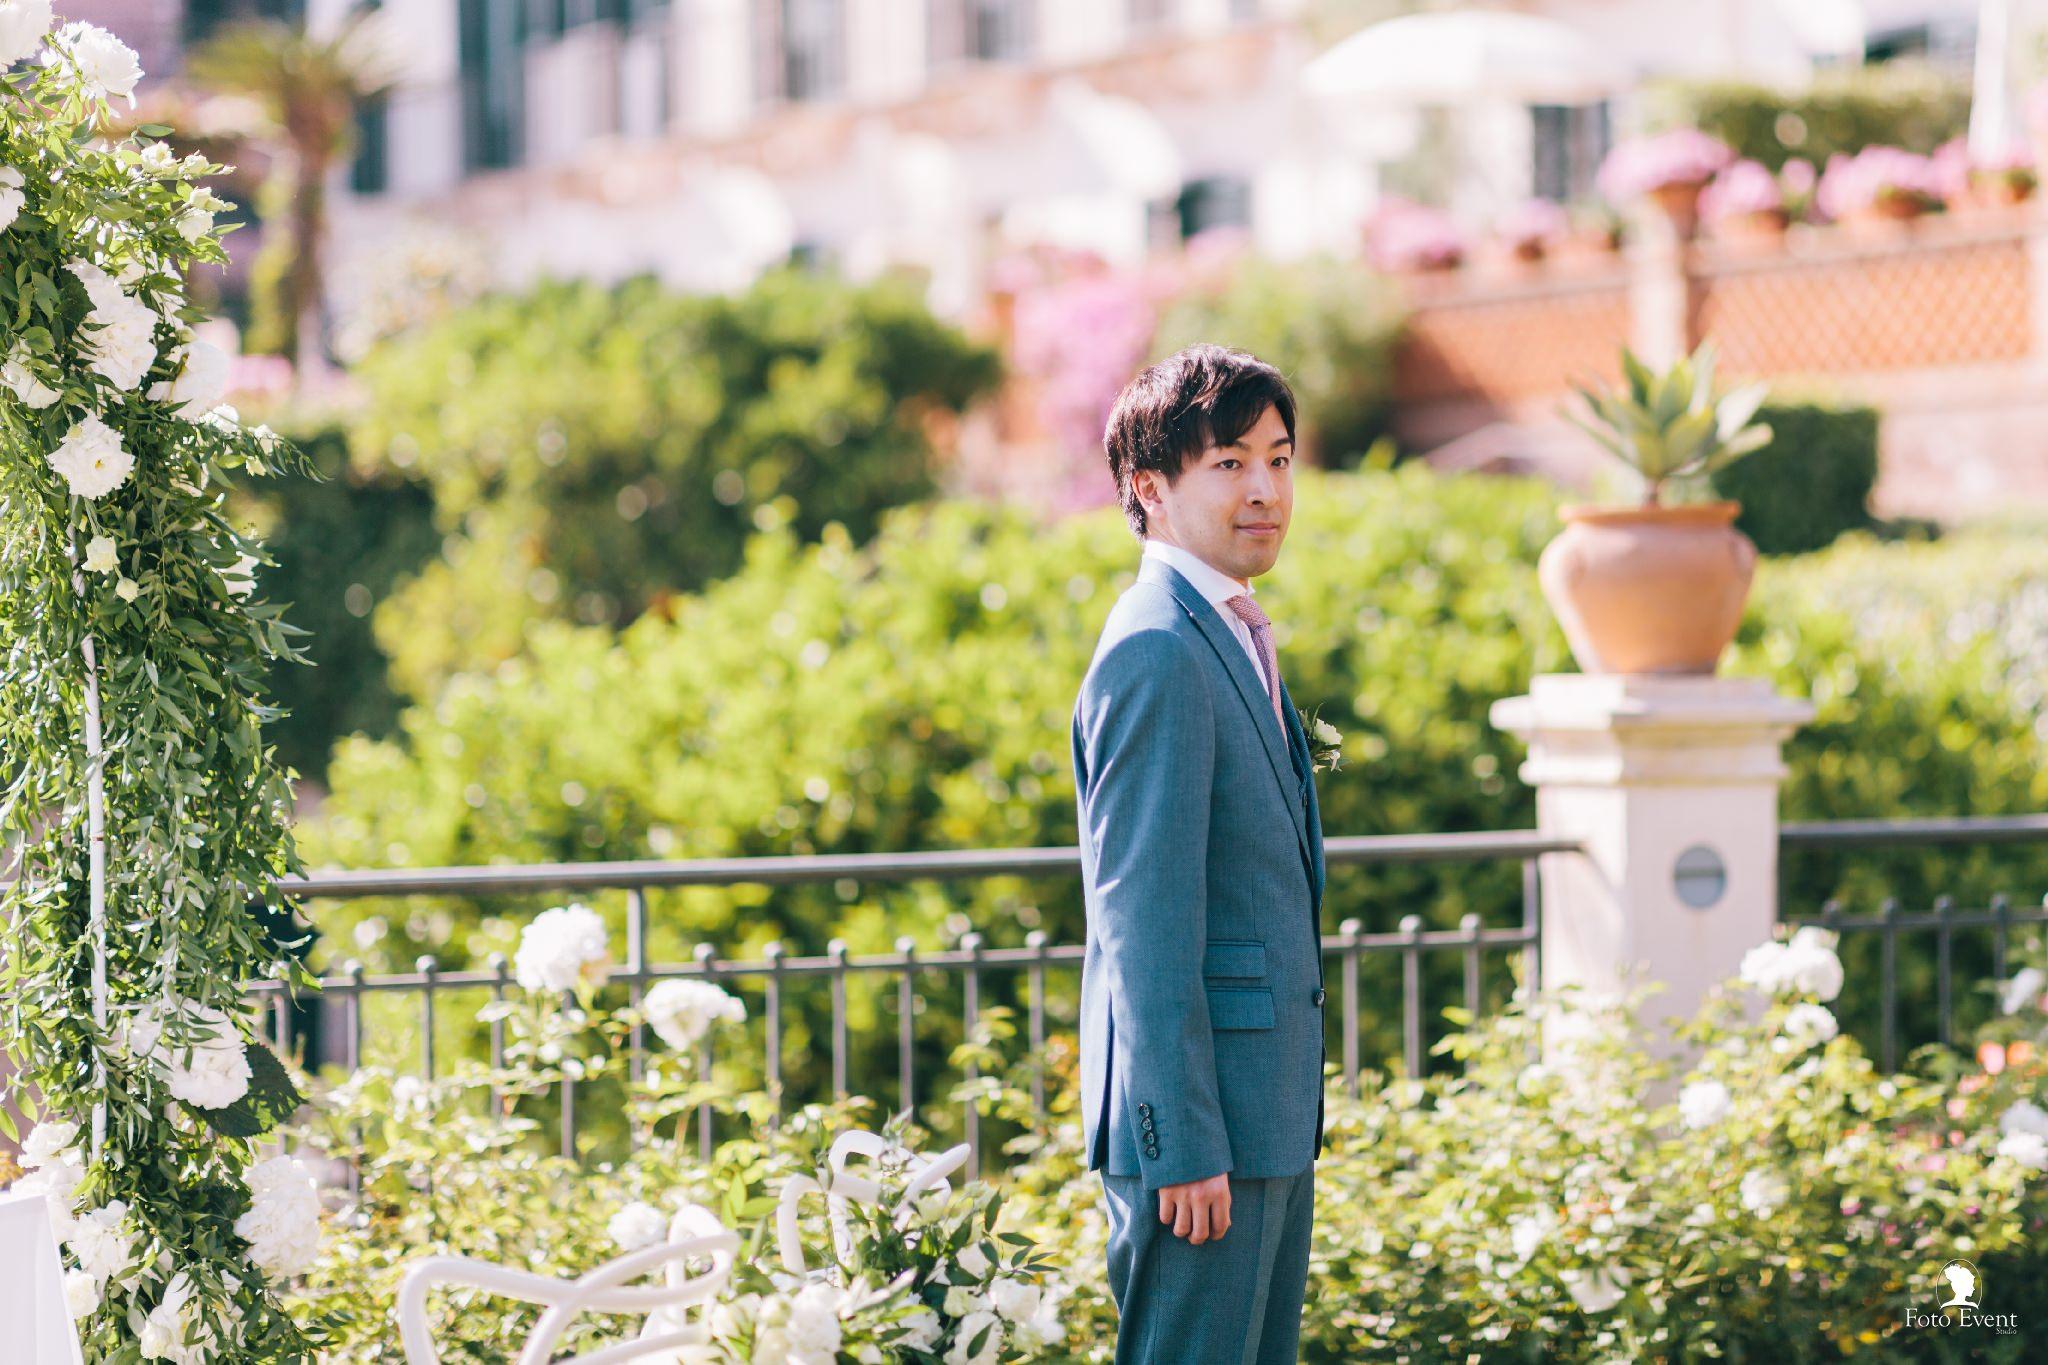 209-2019-06-14-Wedding-Yume-e-Makoto-Isee-80mm-125